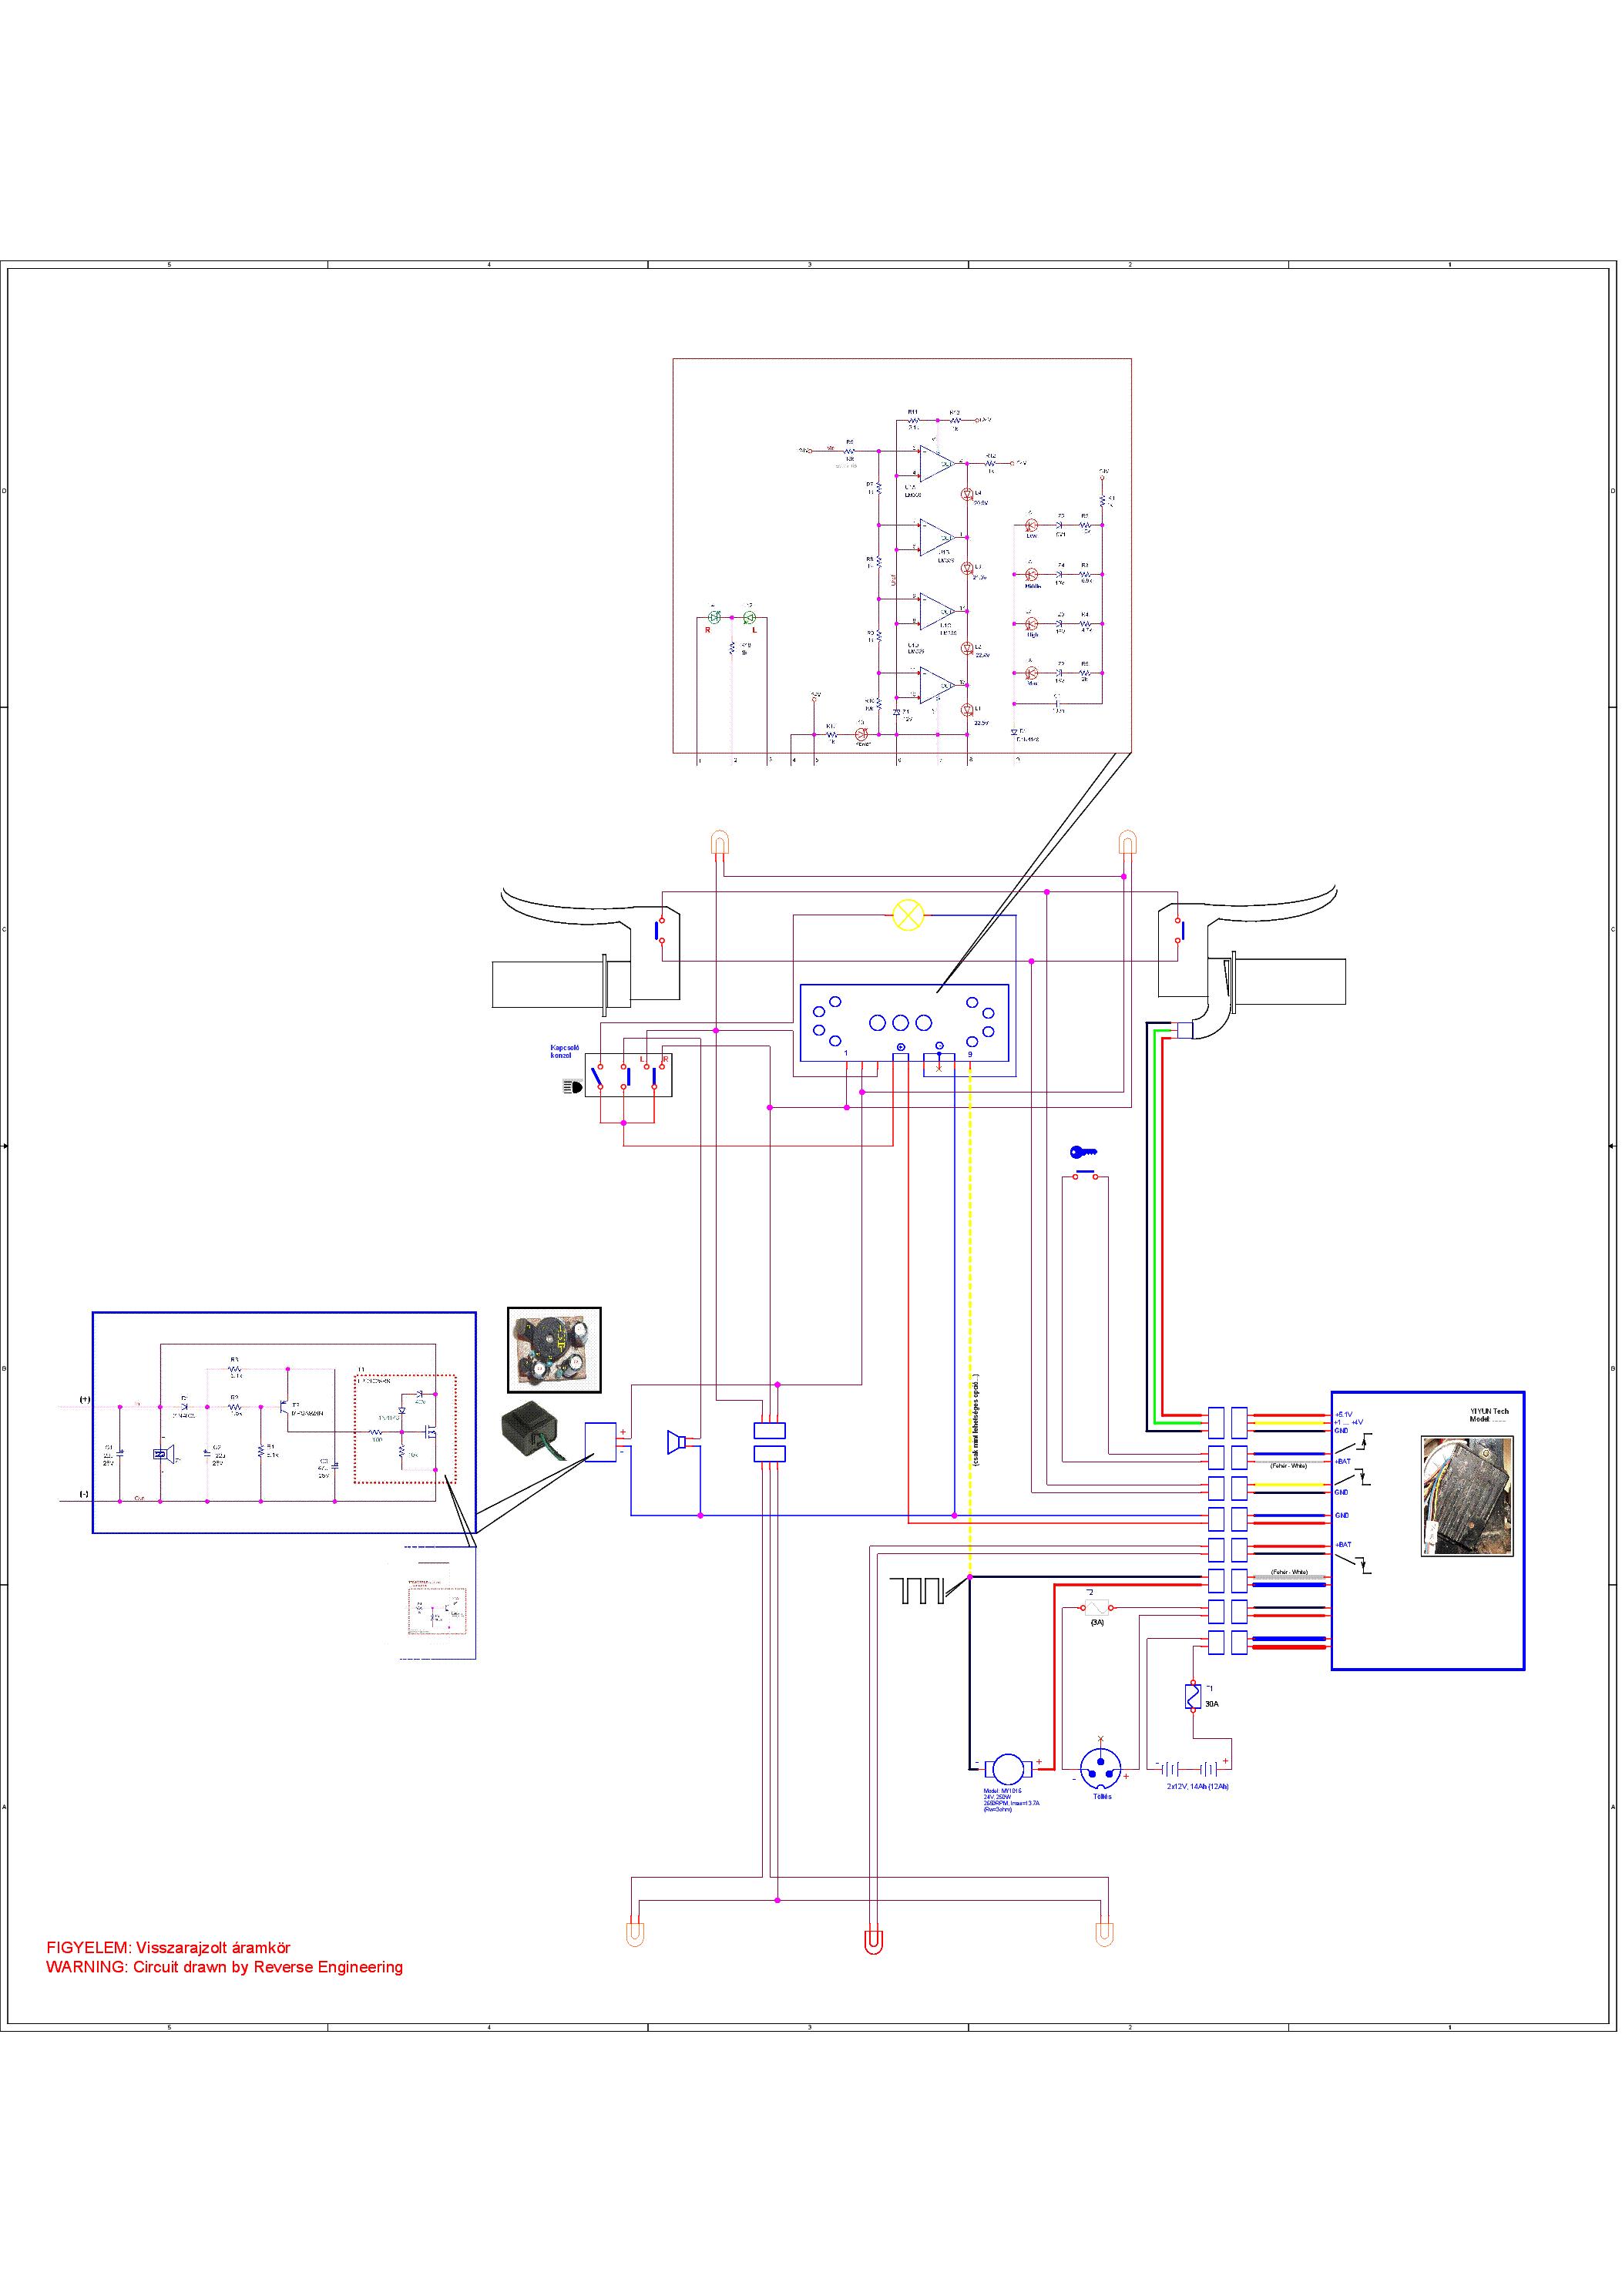 Zv 1620 Wiring Diagram Chinese Scooter Wiring Diagram Scooter Wiring Diagram Wiring Diagram